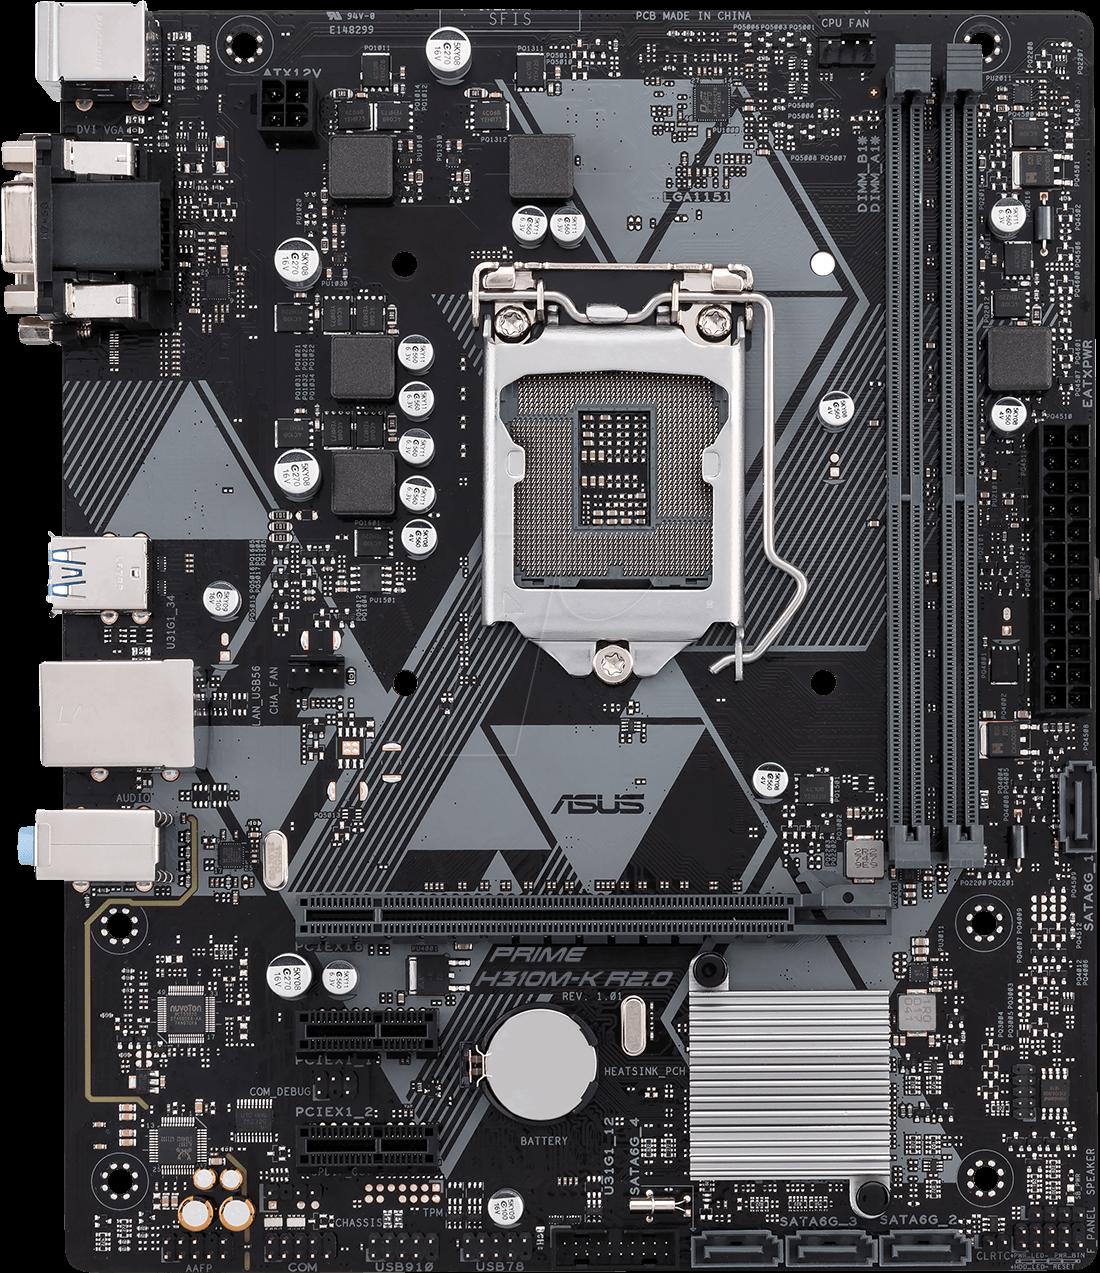 ASUSMB 90MB0Z30: ASUS Prime H310M-K R2.0 (1151) at reichelt elektronik